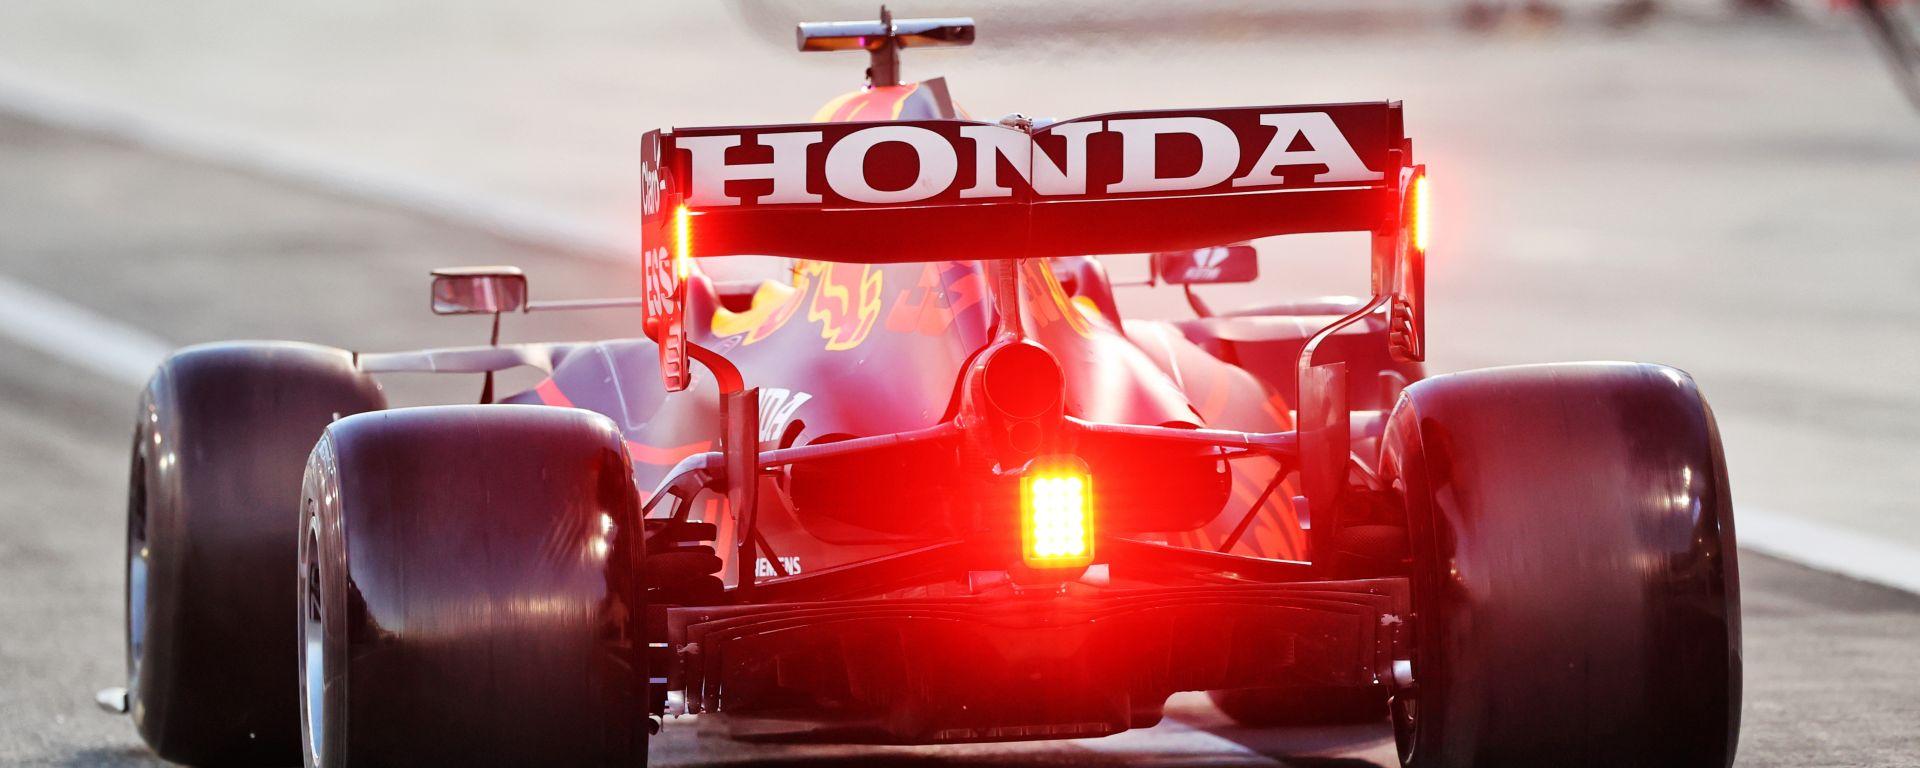 F1 Test Bahrain 2021: l'analisi del day-3 in diretta Instagram - Video